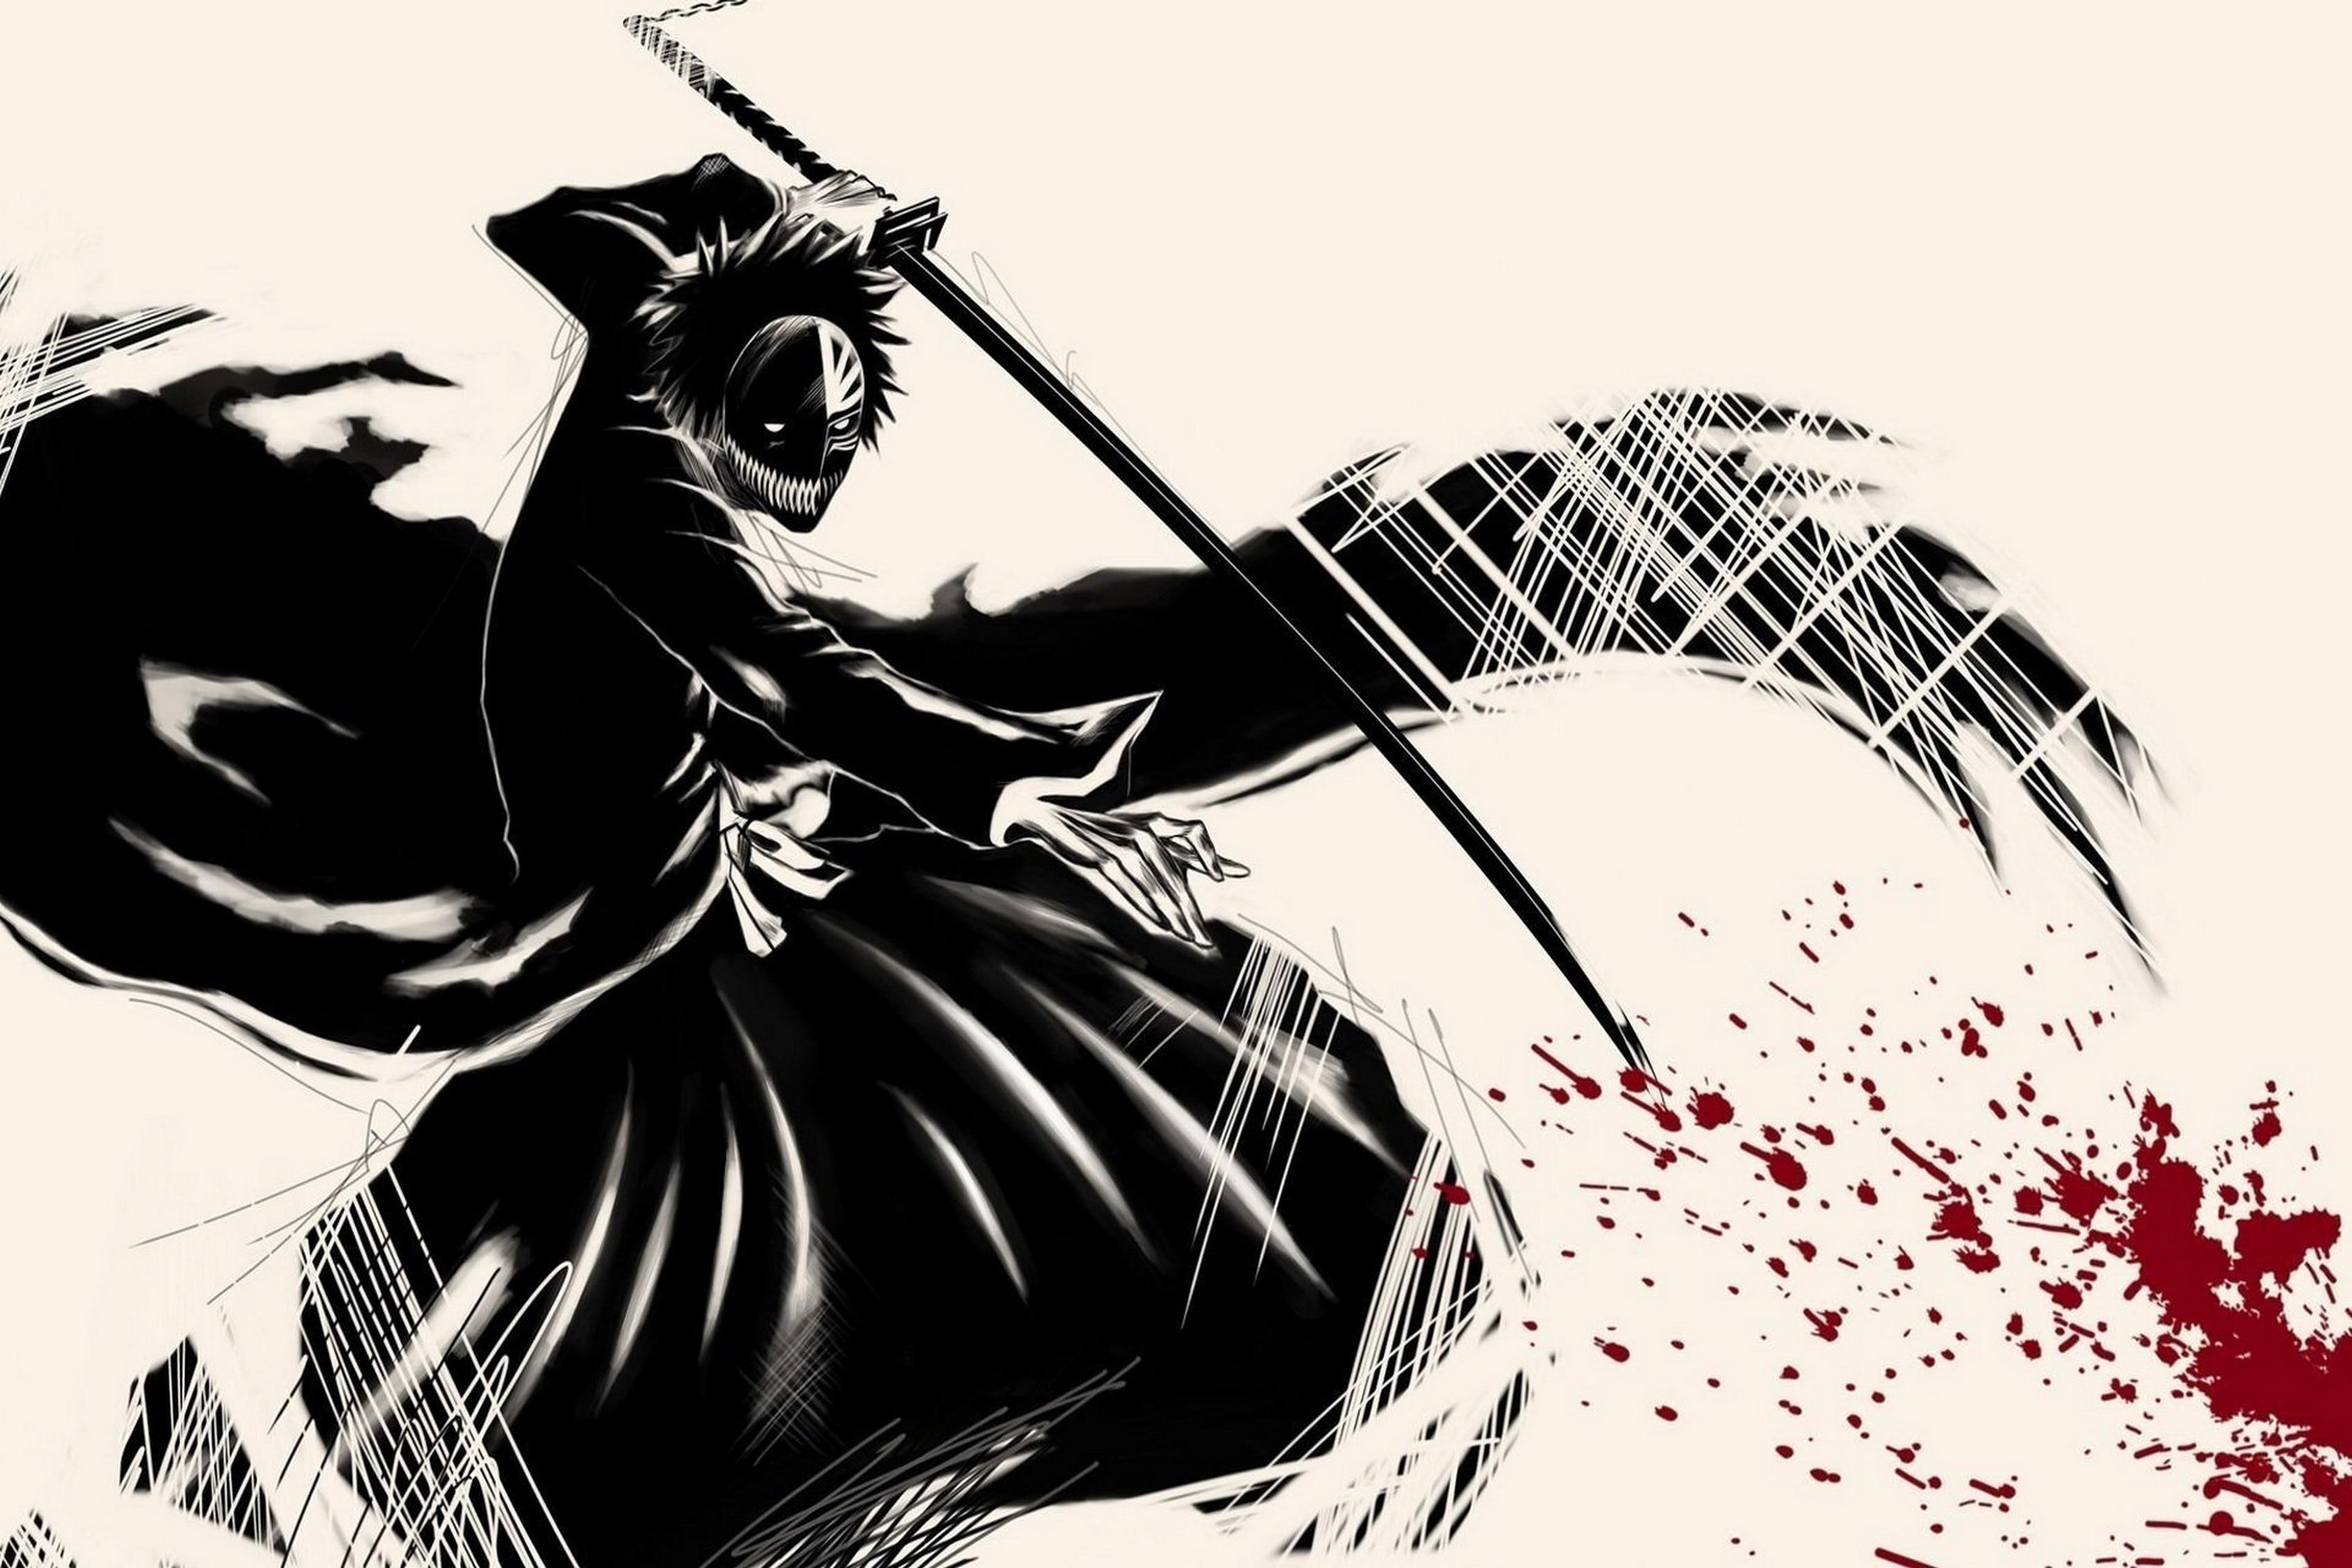 Personaje de anime Bleach Hollow katana con sangre Sala Arte ...